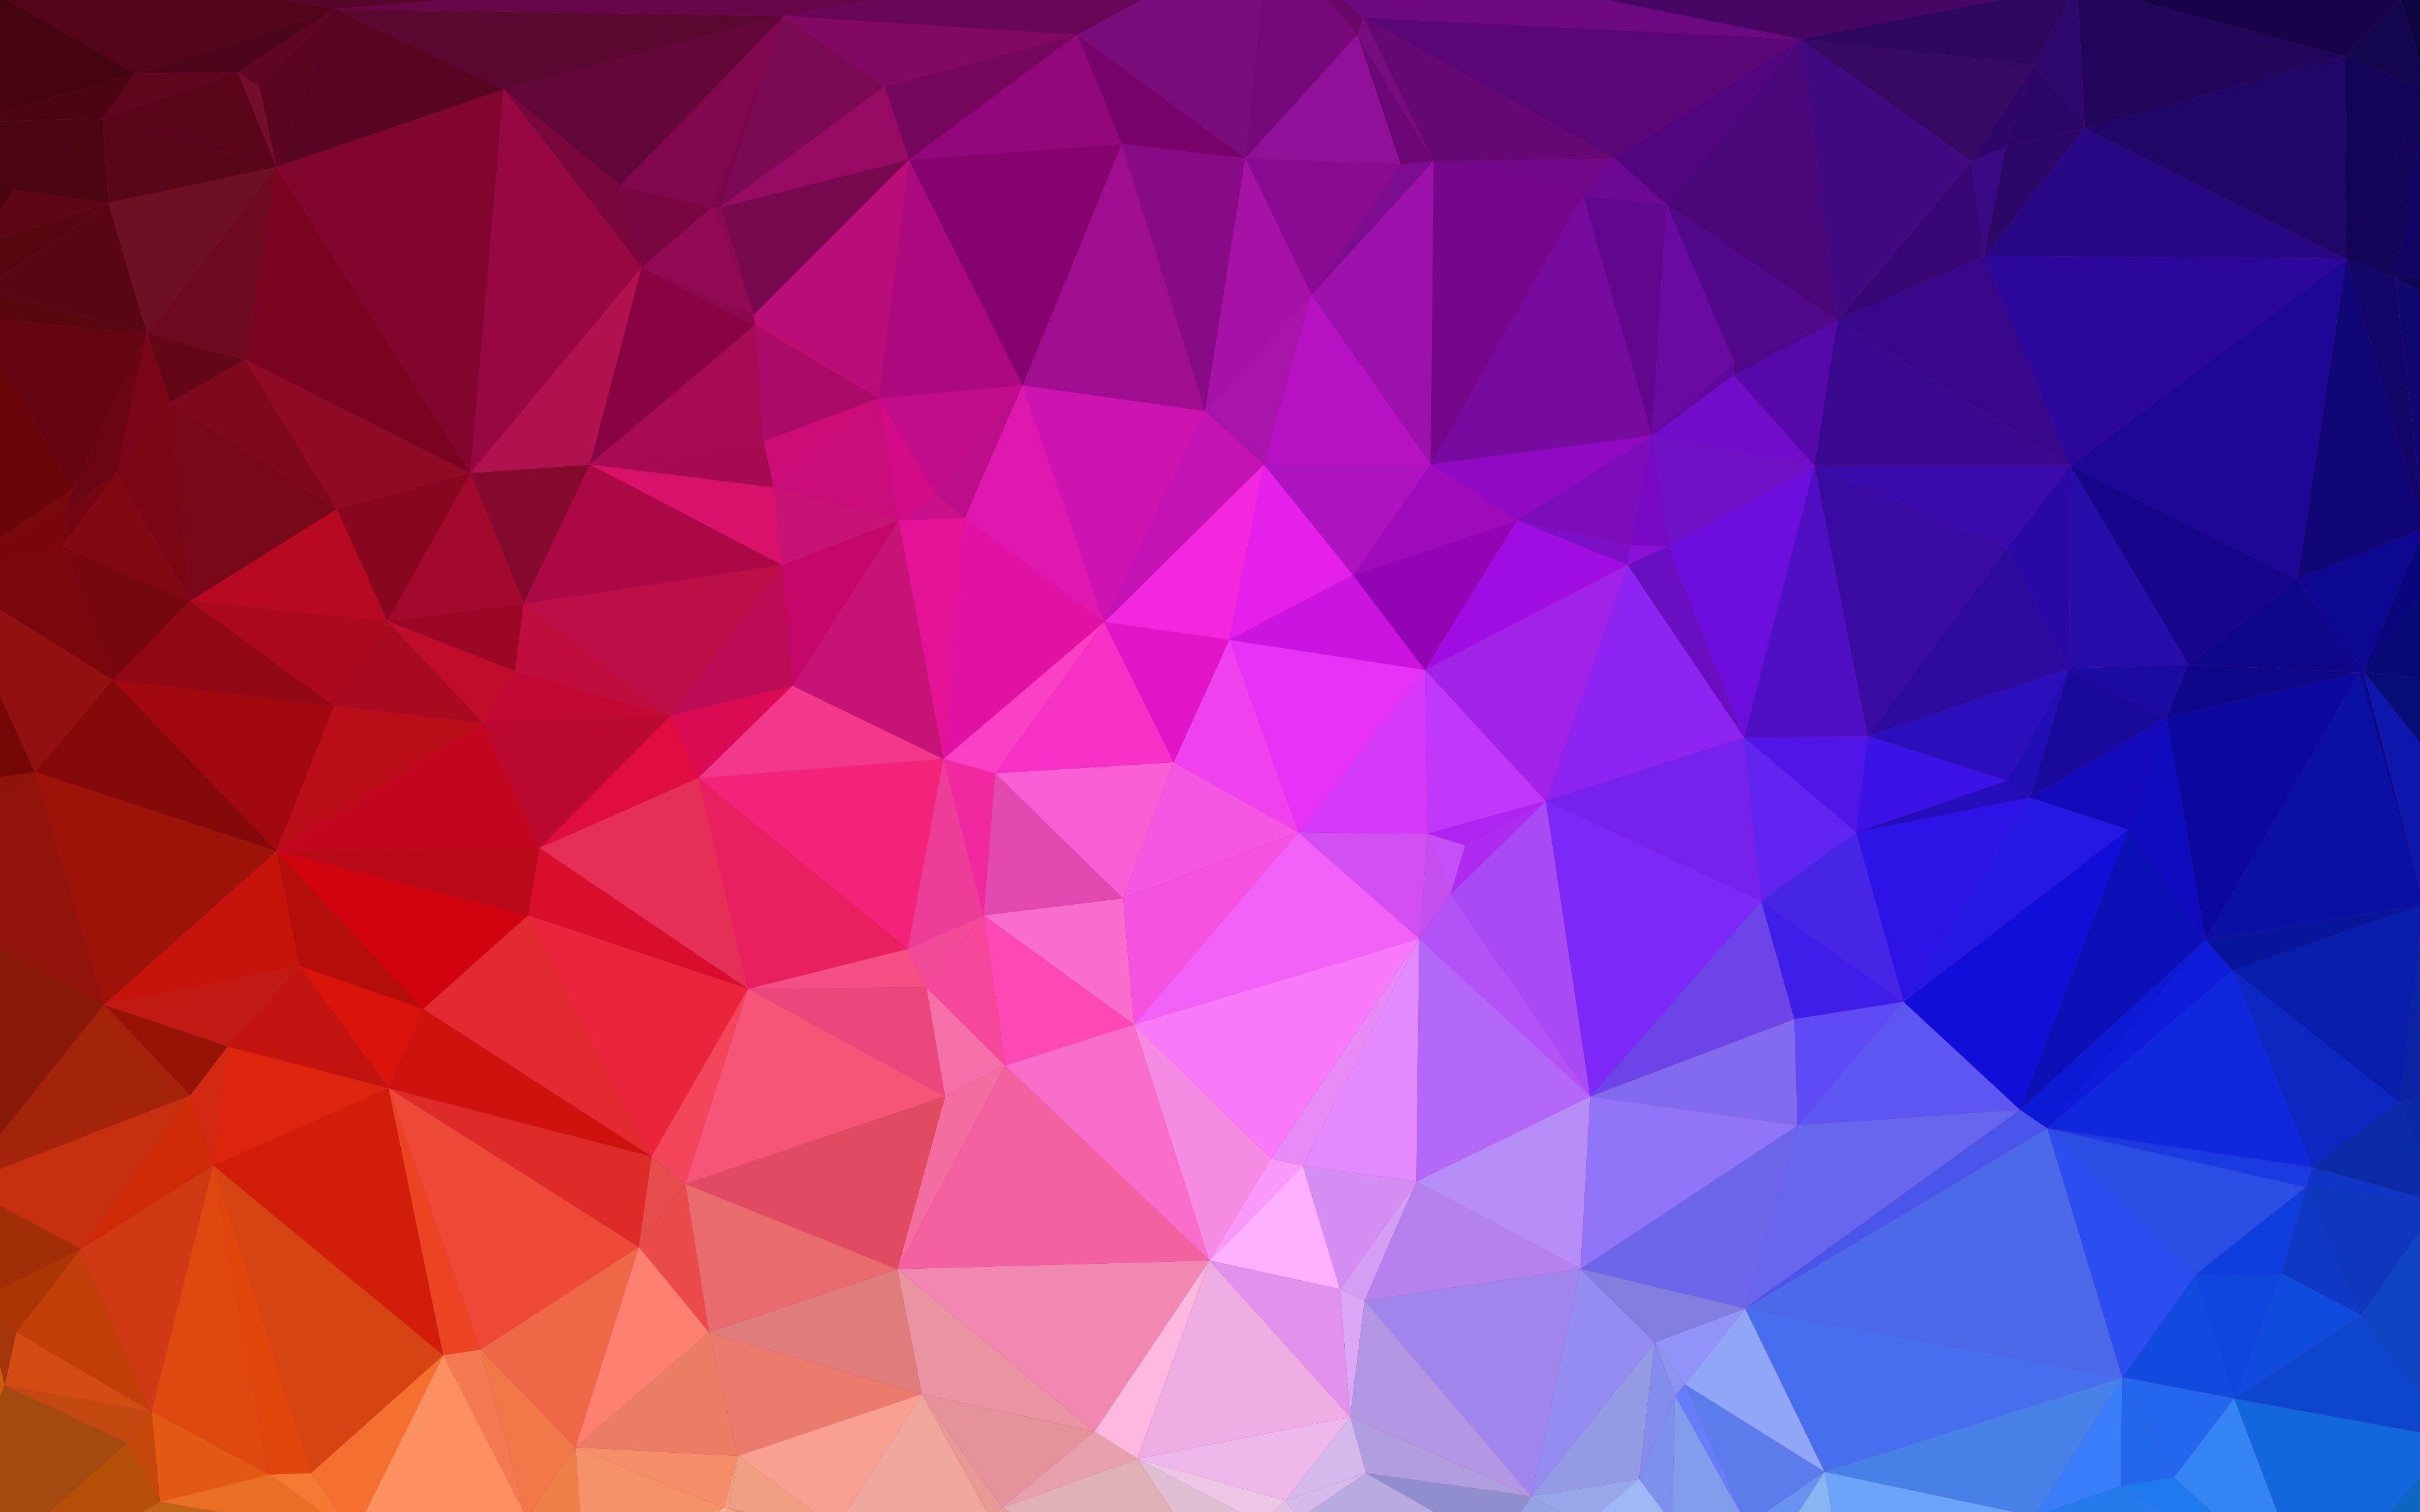 Colorful Geometric Wallpaper Wga02 | WallisMe